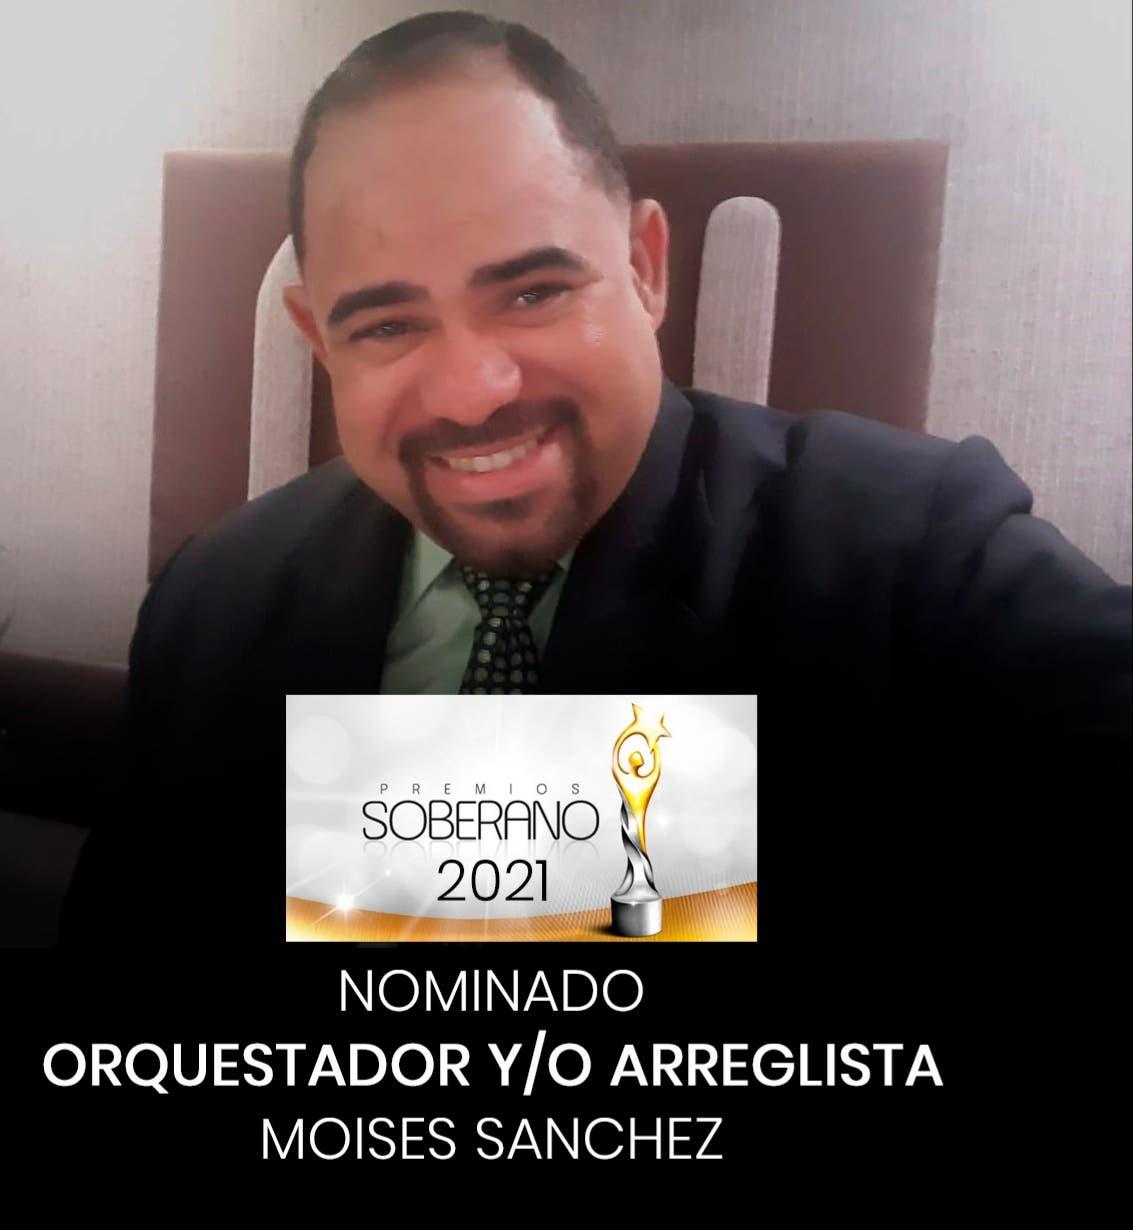 Moisés Sánchez: Un Soberano del Grammy al Galardón